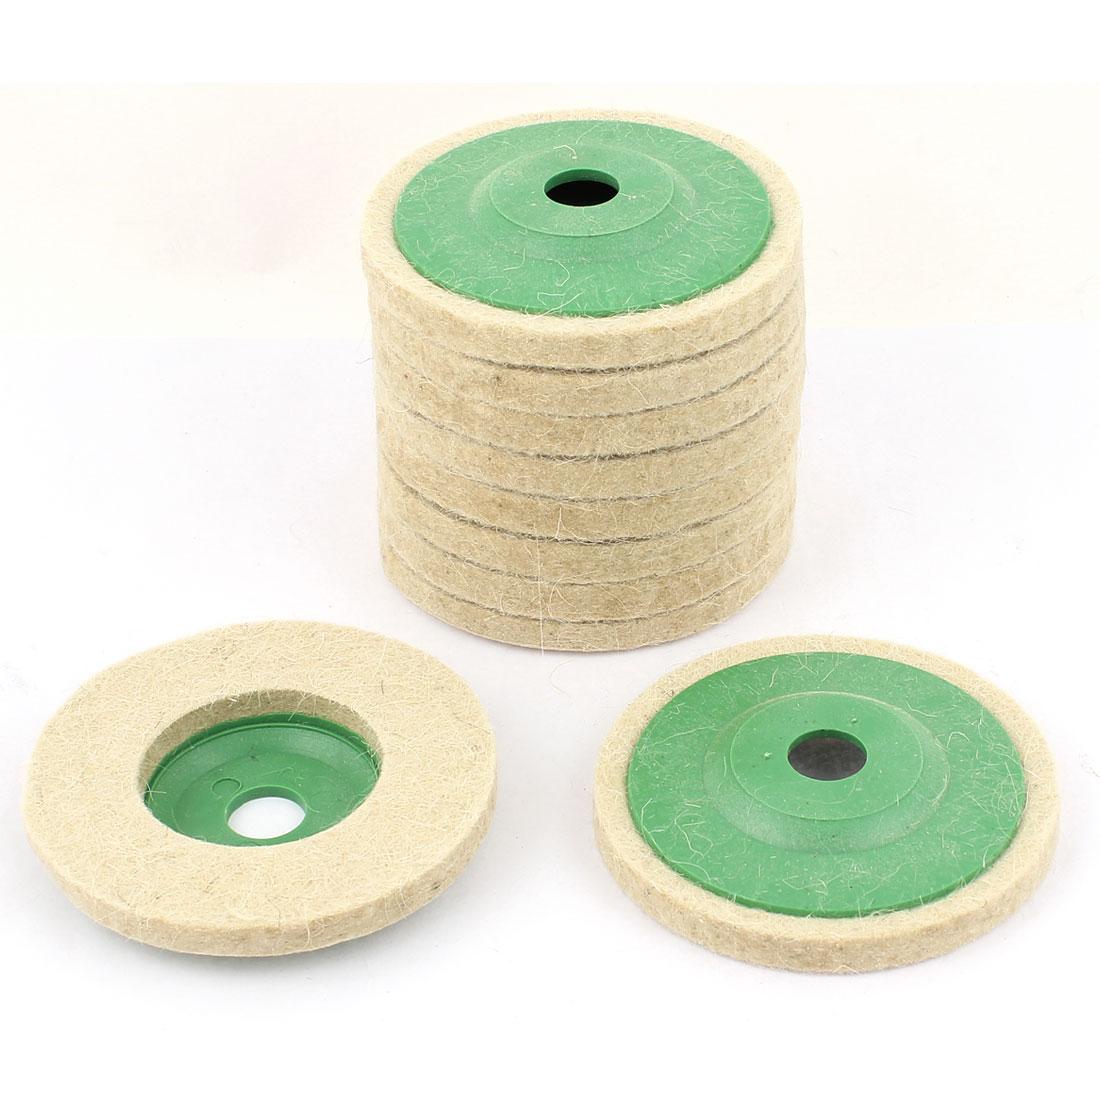 Beige 95mm Outer Dia Wool Felt Polishing Wheel Buffing Discs Pads 10pcs